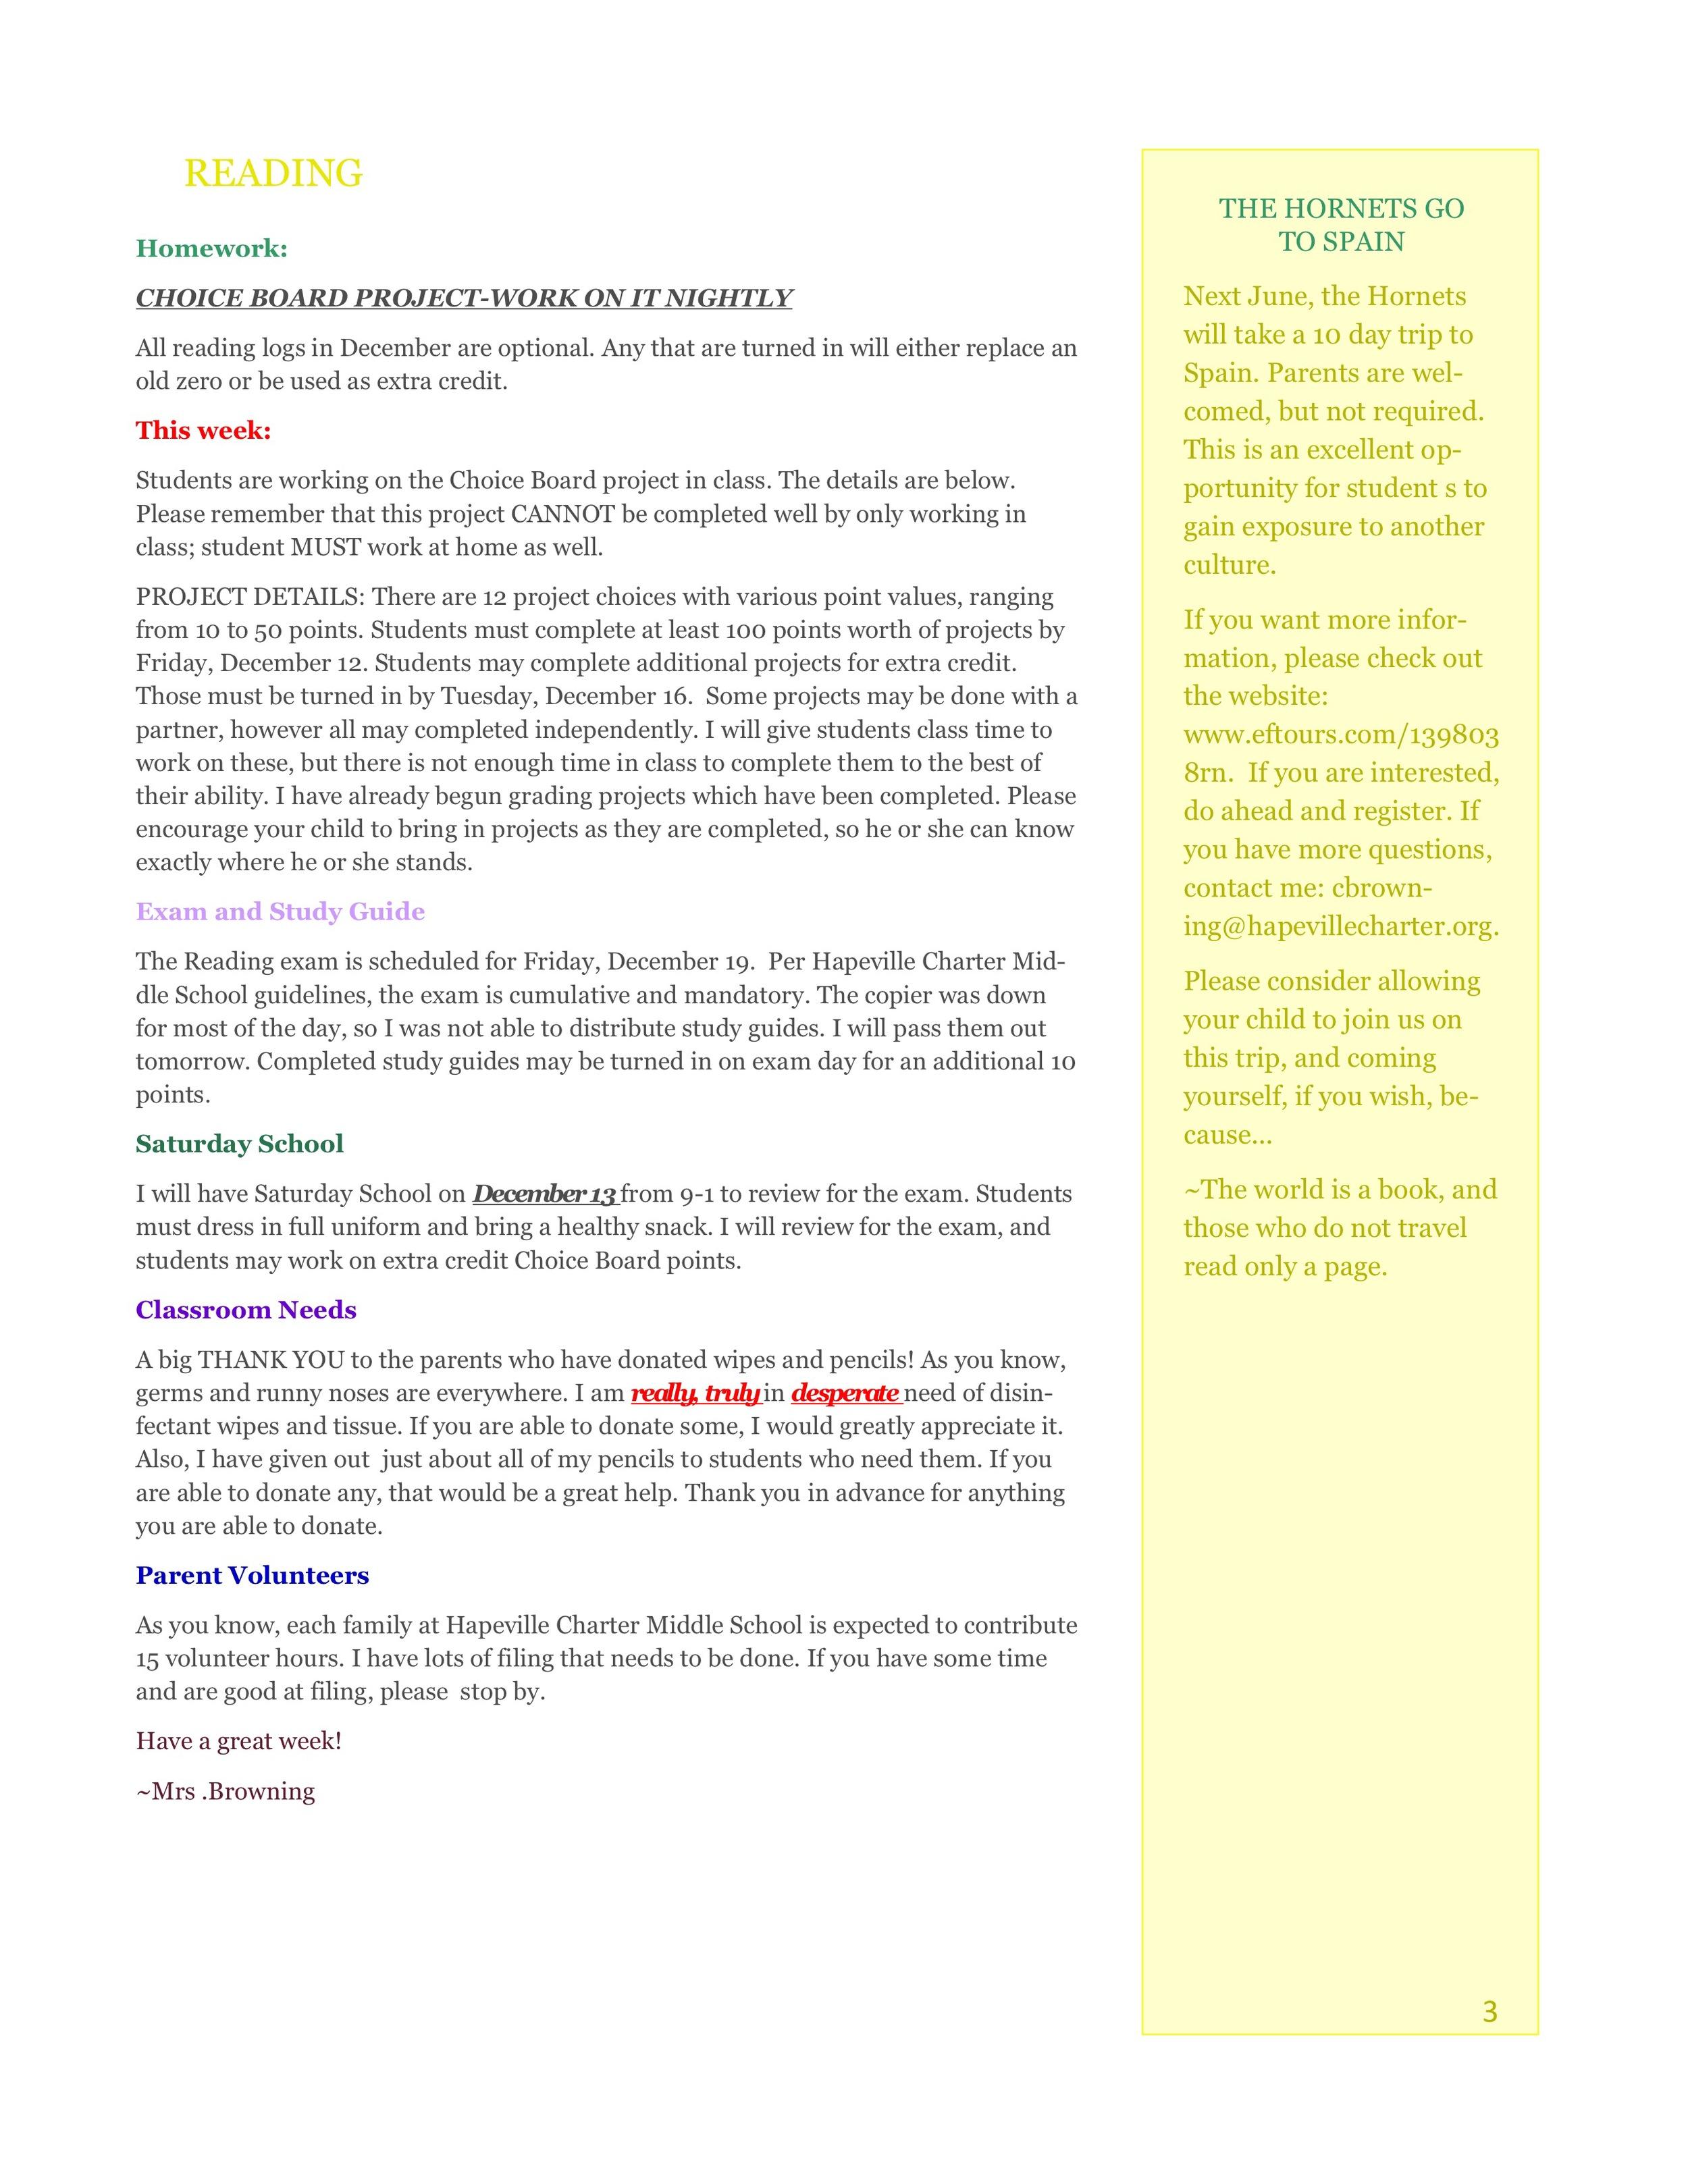 Newsletter Image6th grade December 8-12 3.jpeg